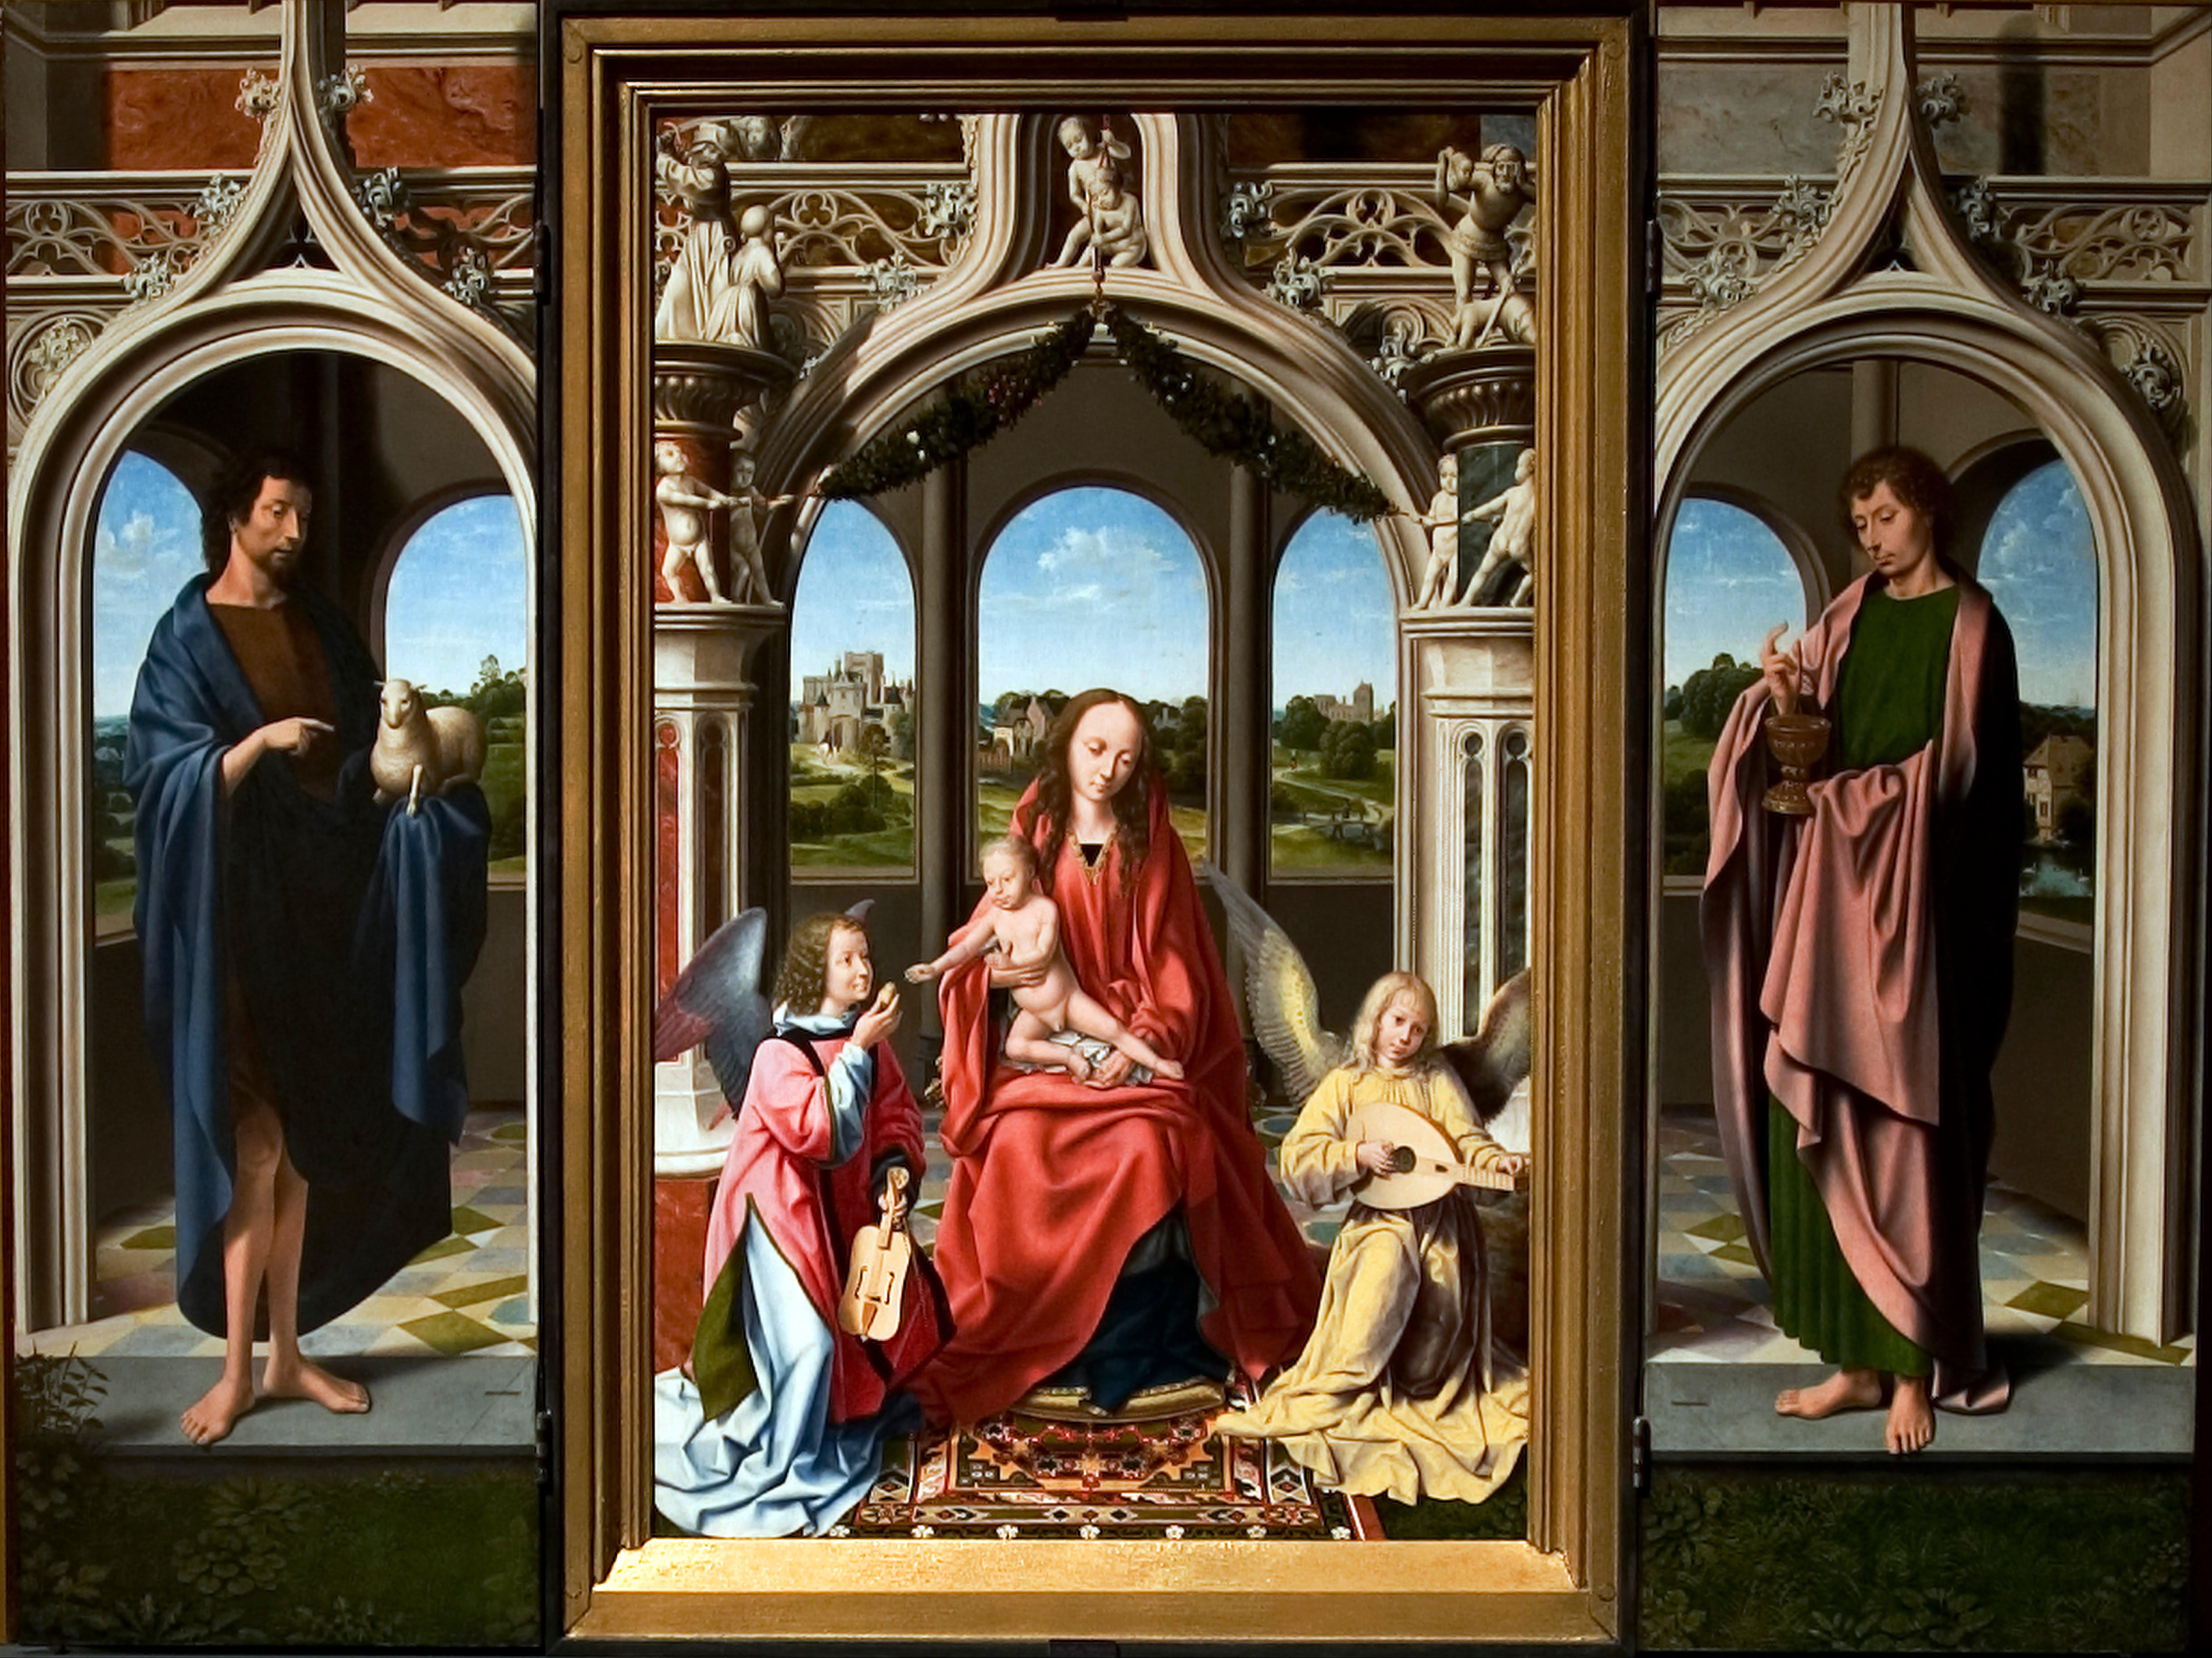 P Triptych - Lessons - Tes Teach